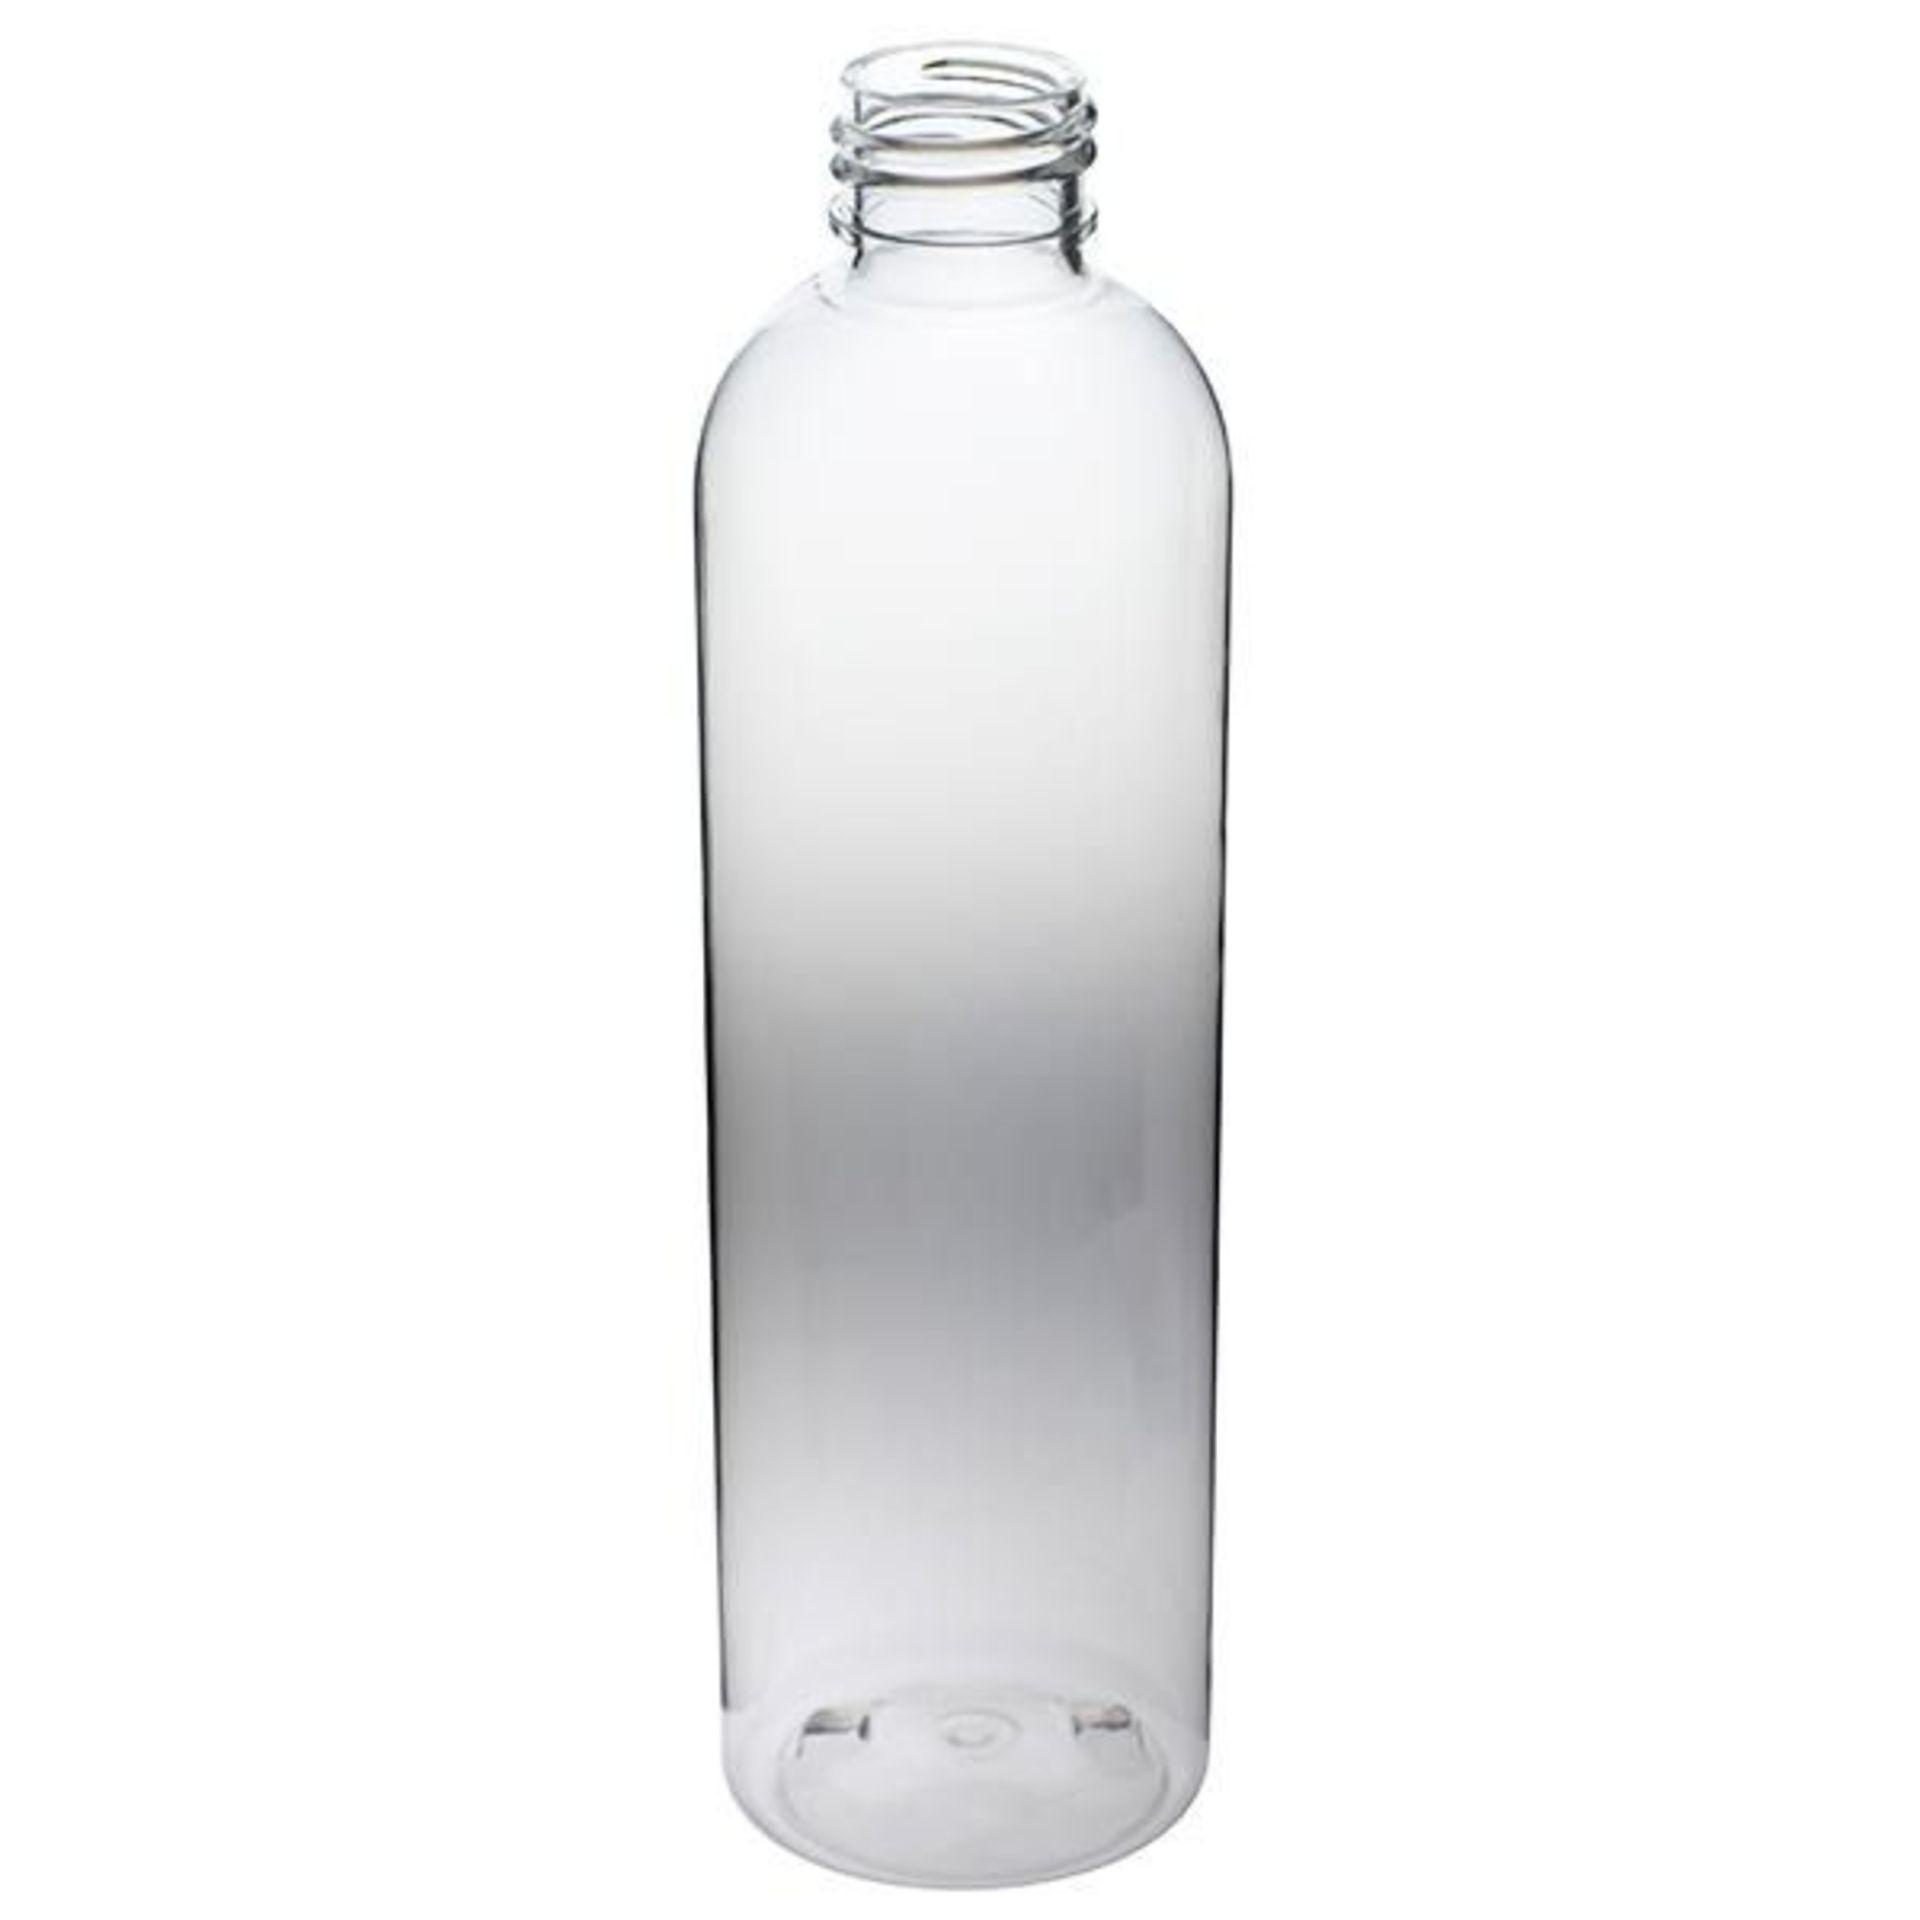 "75,000 - Clear Plastic Bullet 8 oz Empty Bottles, 24-410 Threading Neck, 6.25"" Tall, 2"" Diameter"